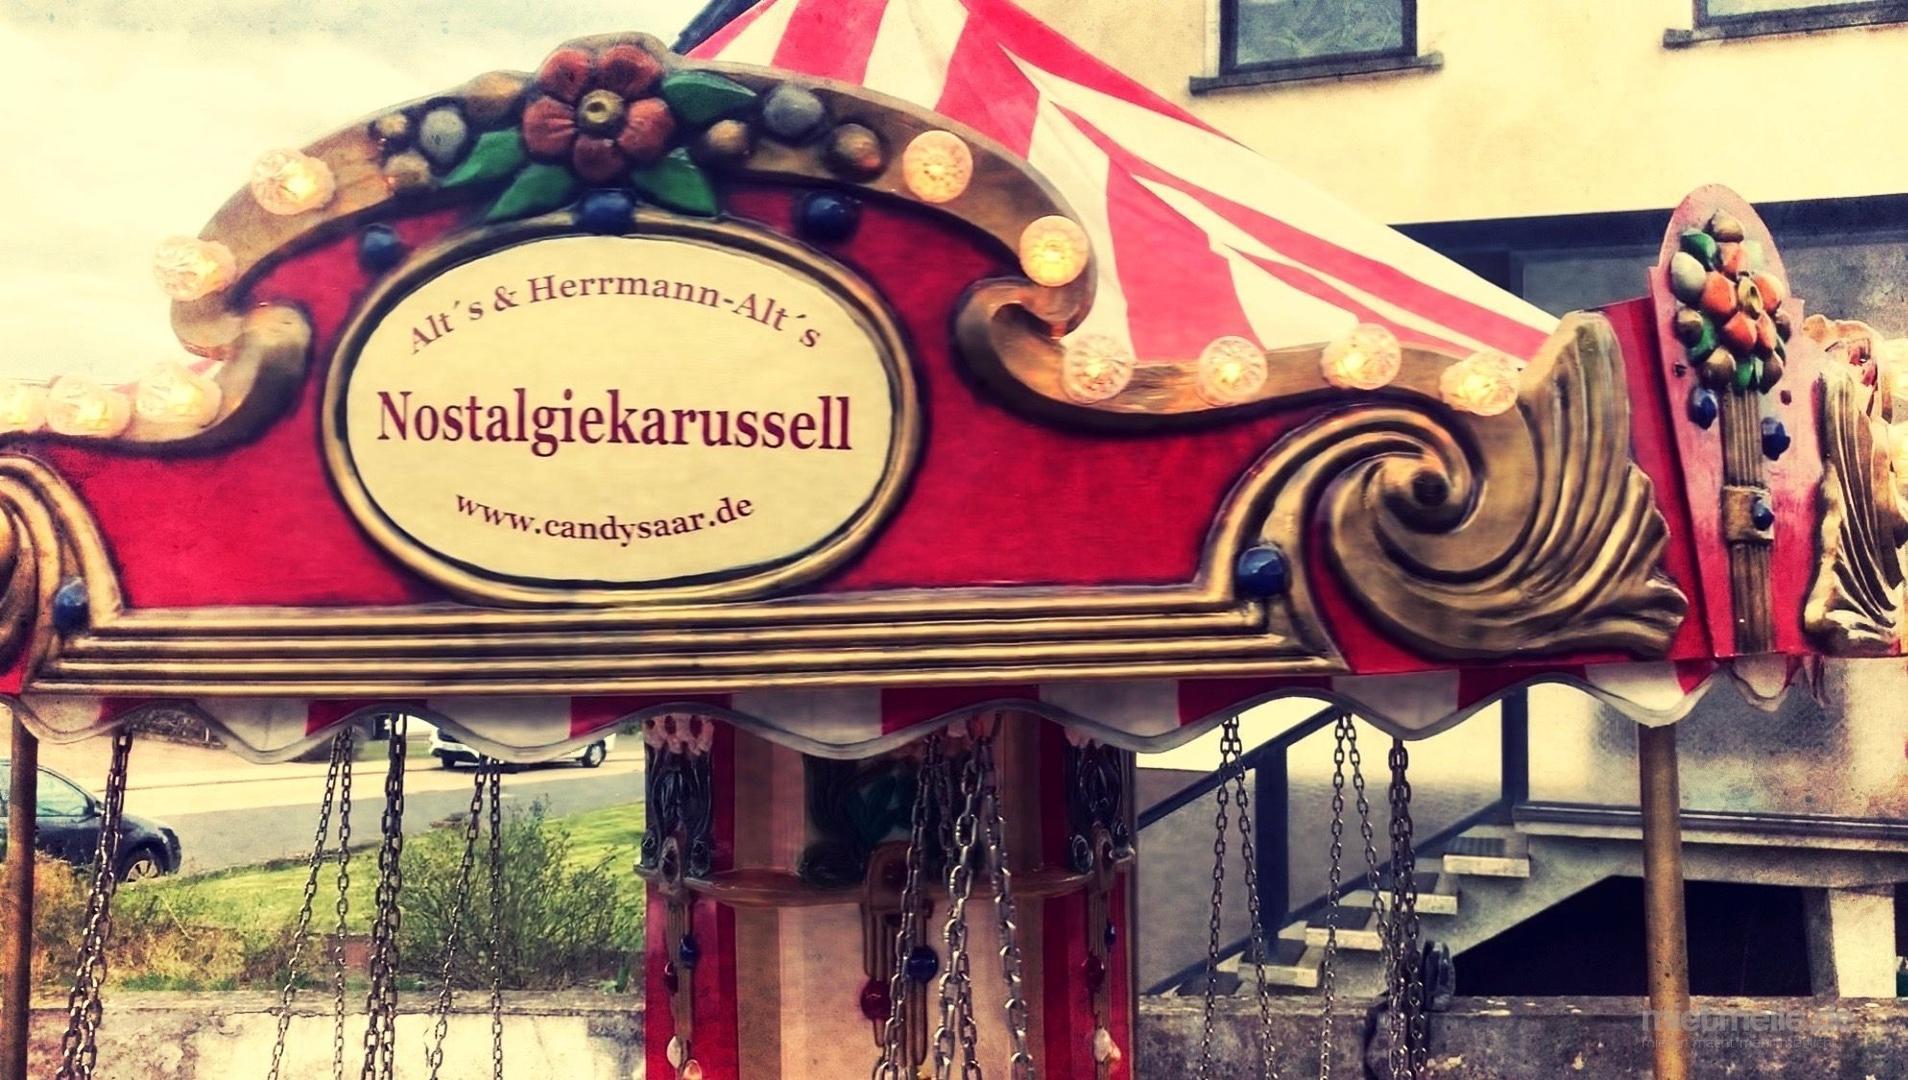 Karussell mieten & vermieten - Kinder Nostalgiekarussell * Kettenkarussell * Karussell in Illingen